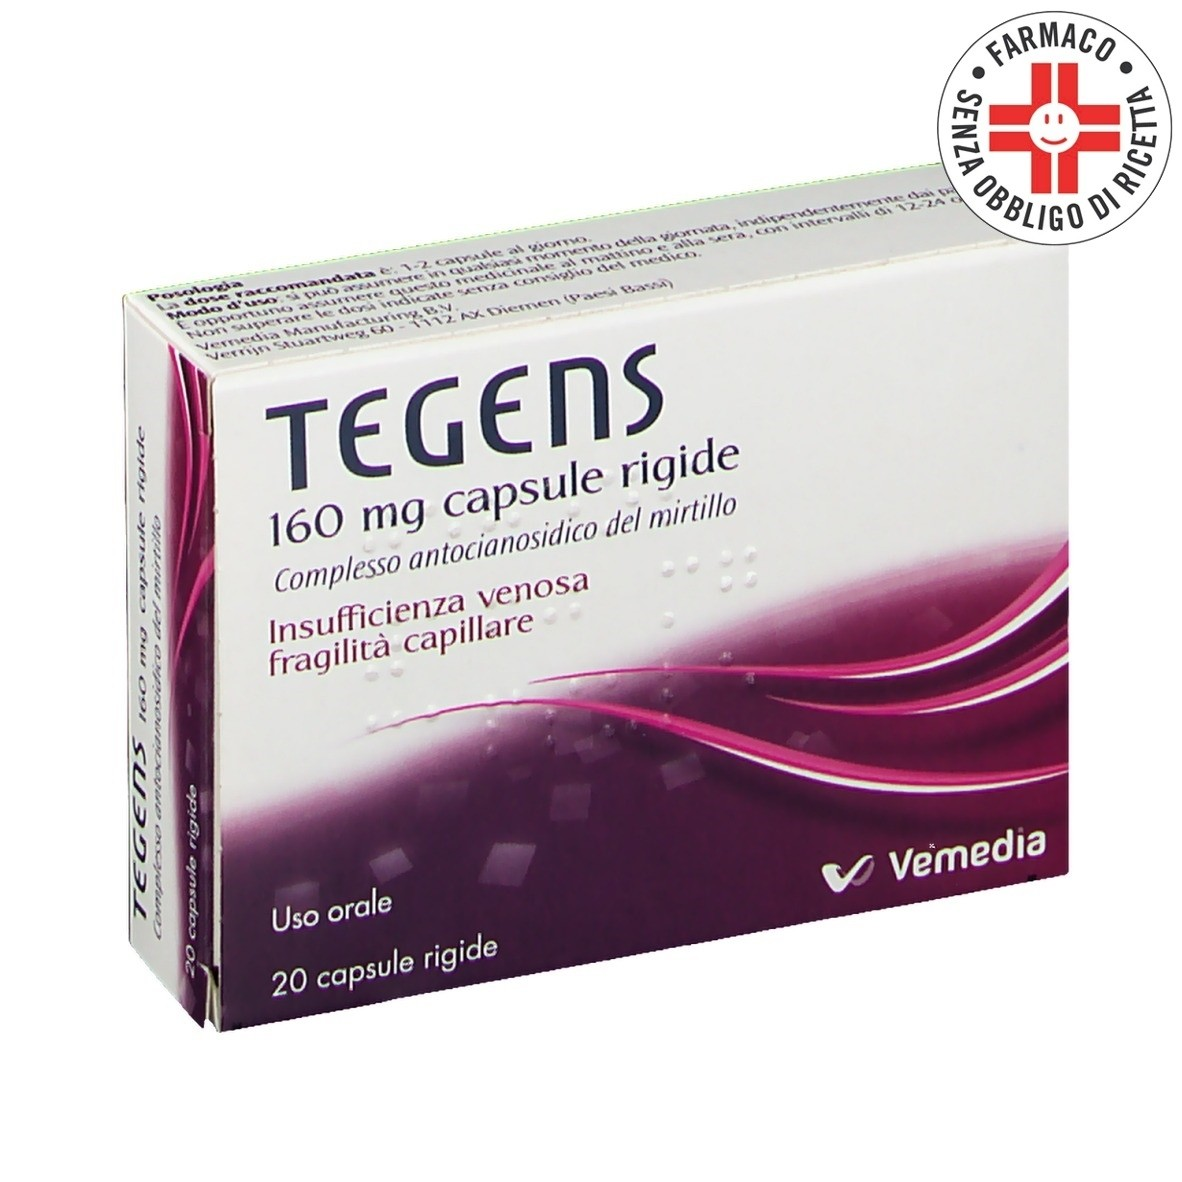 Tegens* 20 capsule 160mg